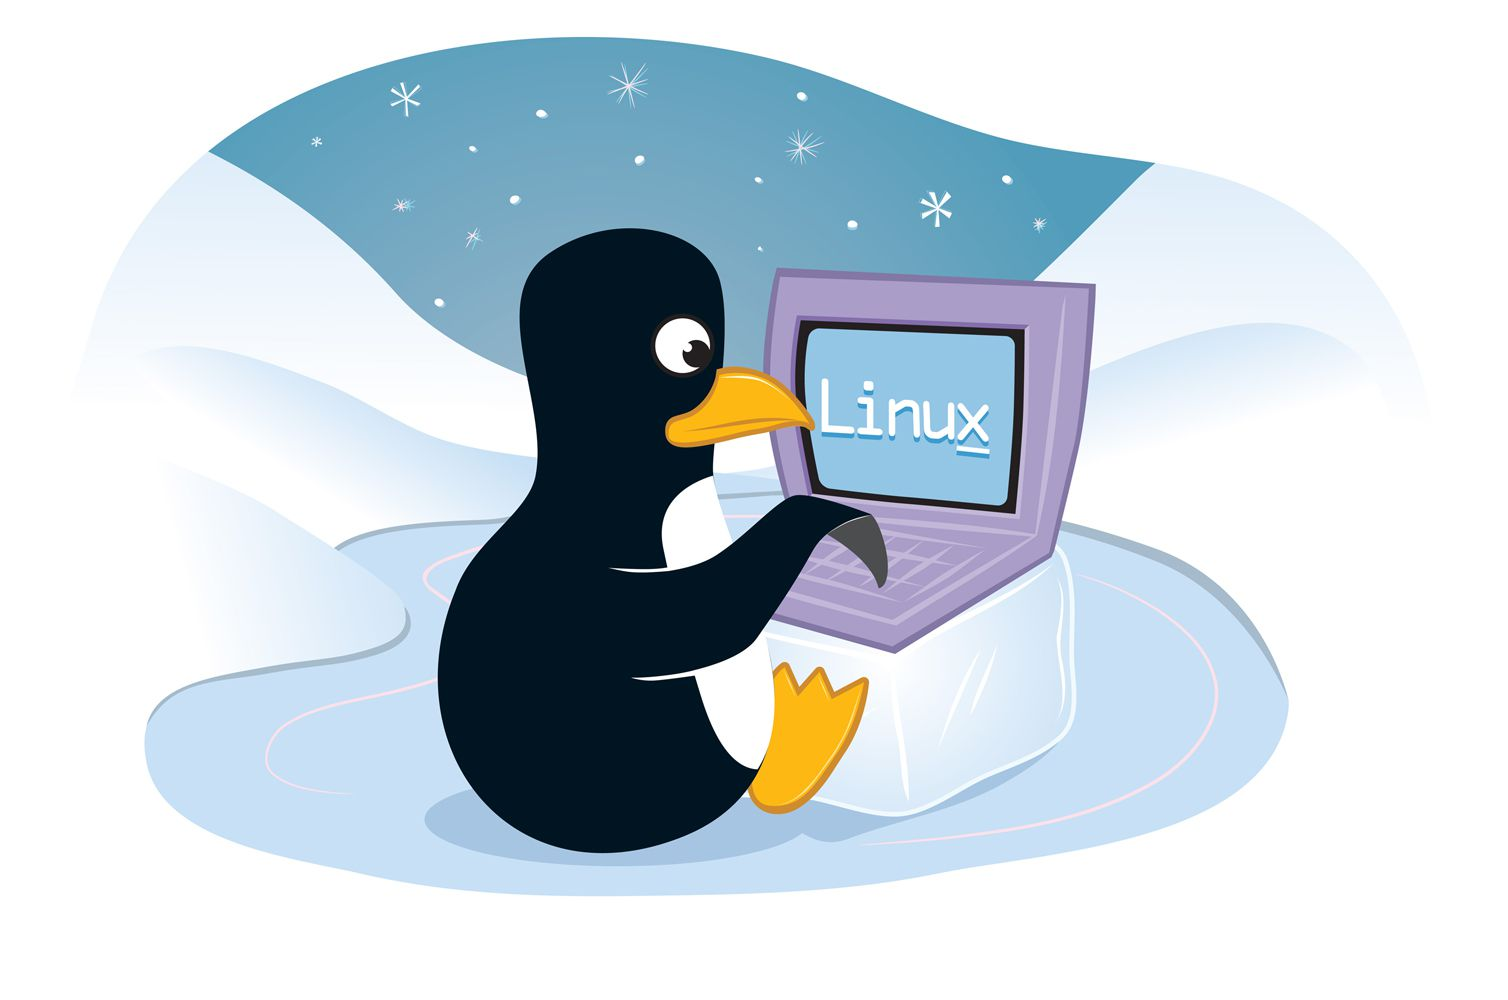 Penguin using laptop